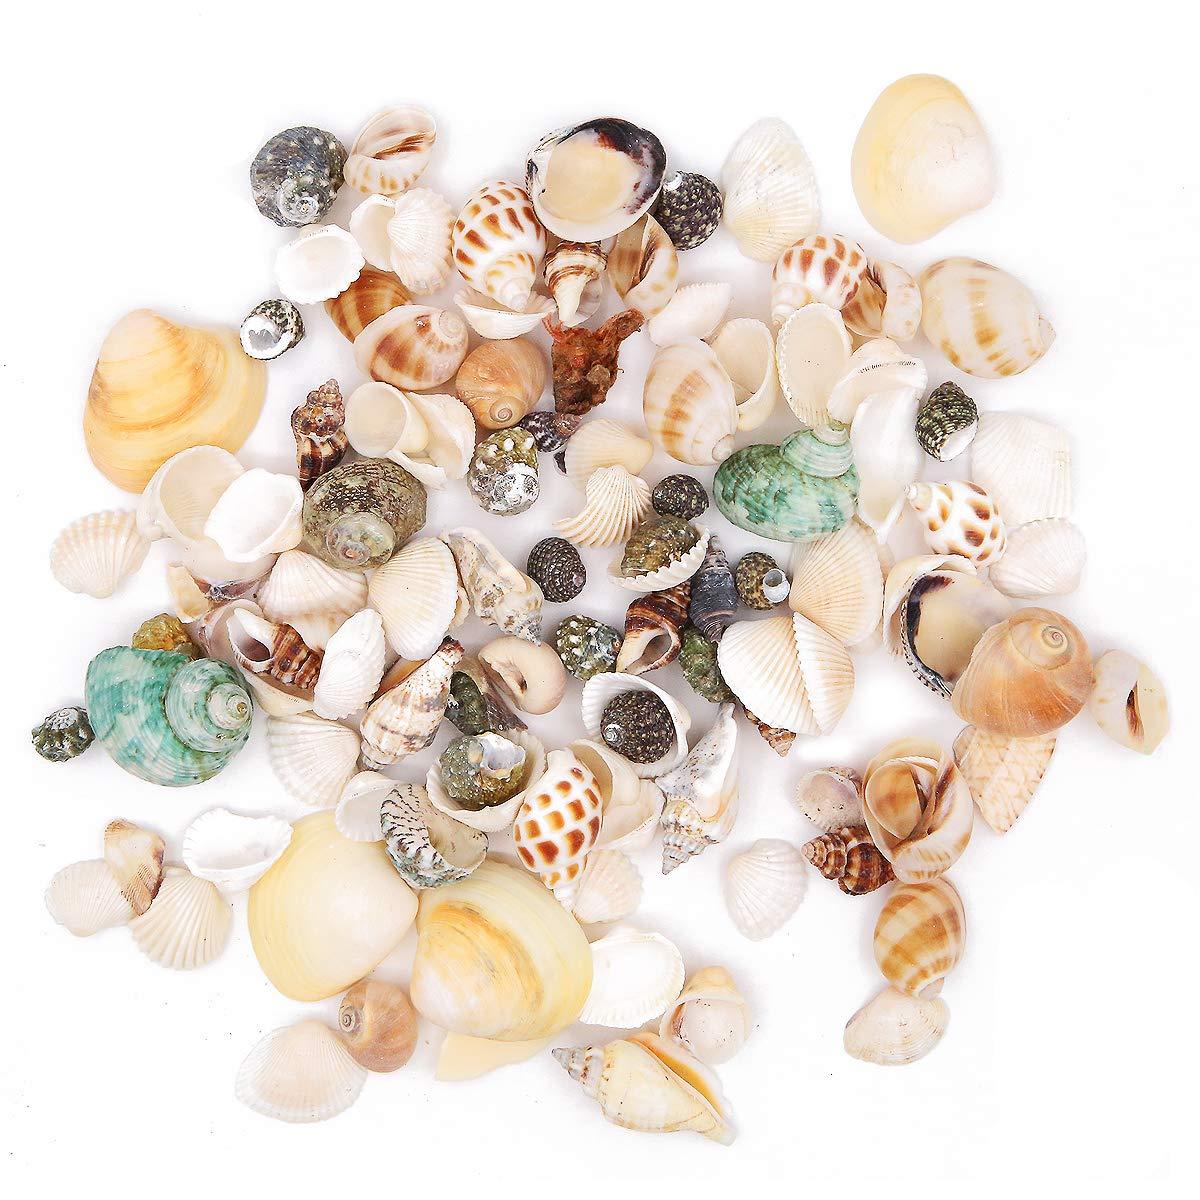 Conchas naturales conchas de playa conchas de boda exhibición manualidades acuario pecera tanque decoración 250 g: Amazon.es: Hogar